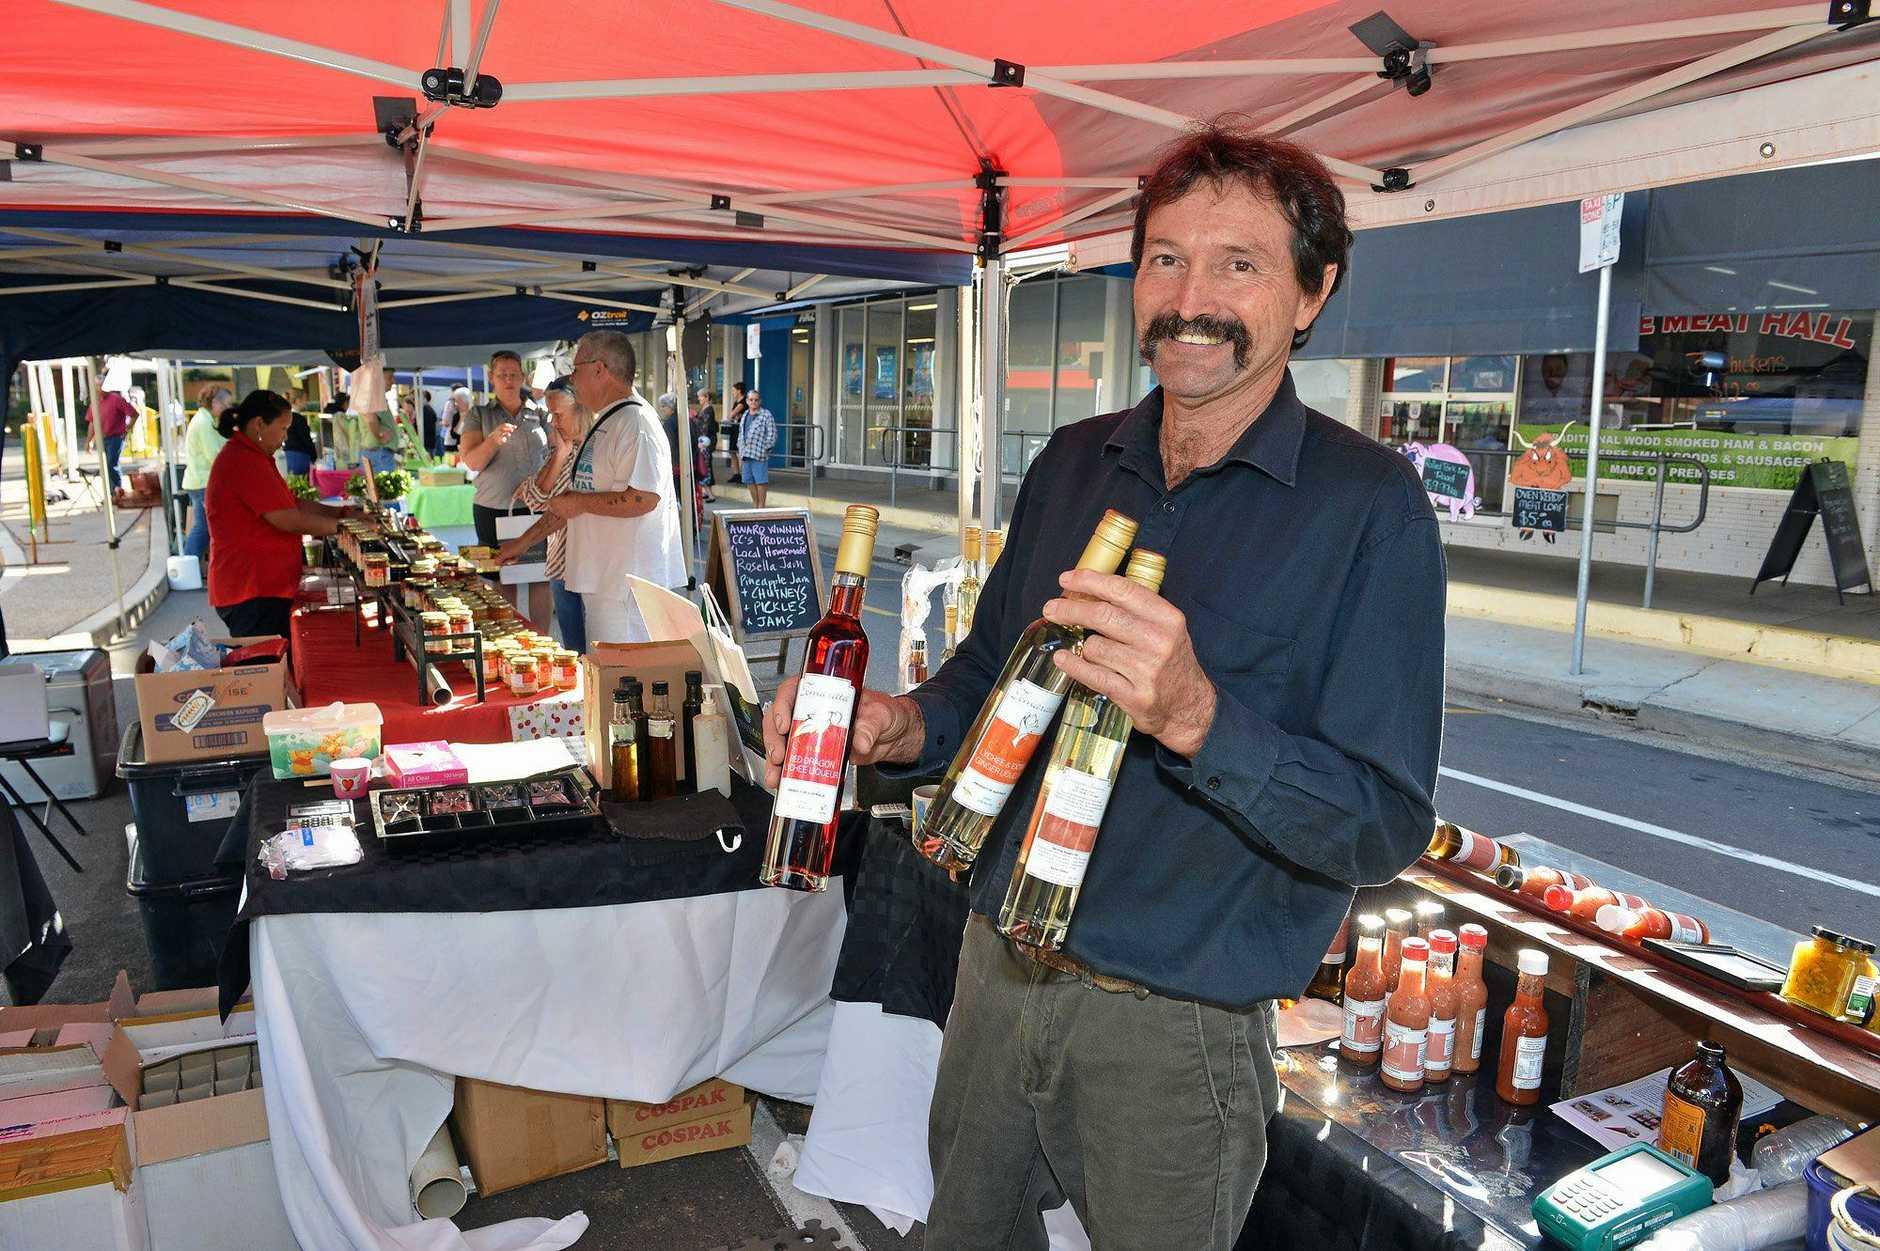 Smithfield Street, Market Gympie. John Pool from Lychee Divine, Tinana selling award winning Liquers.   Photo Greg Miller / Gympie Times